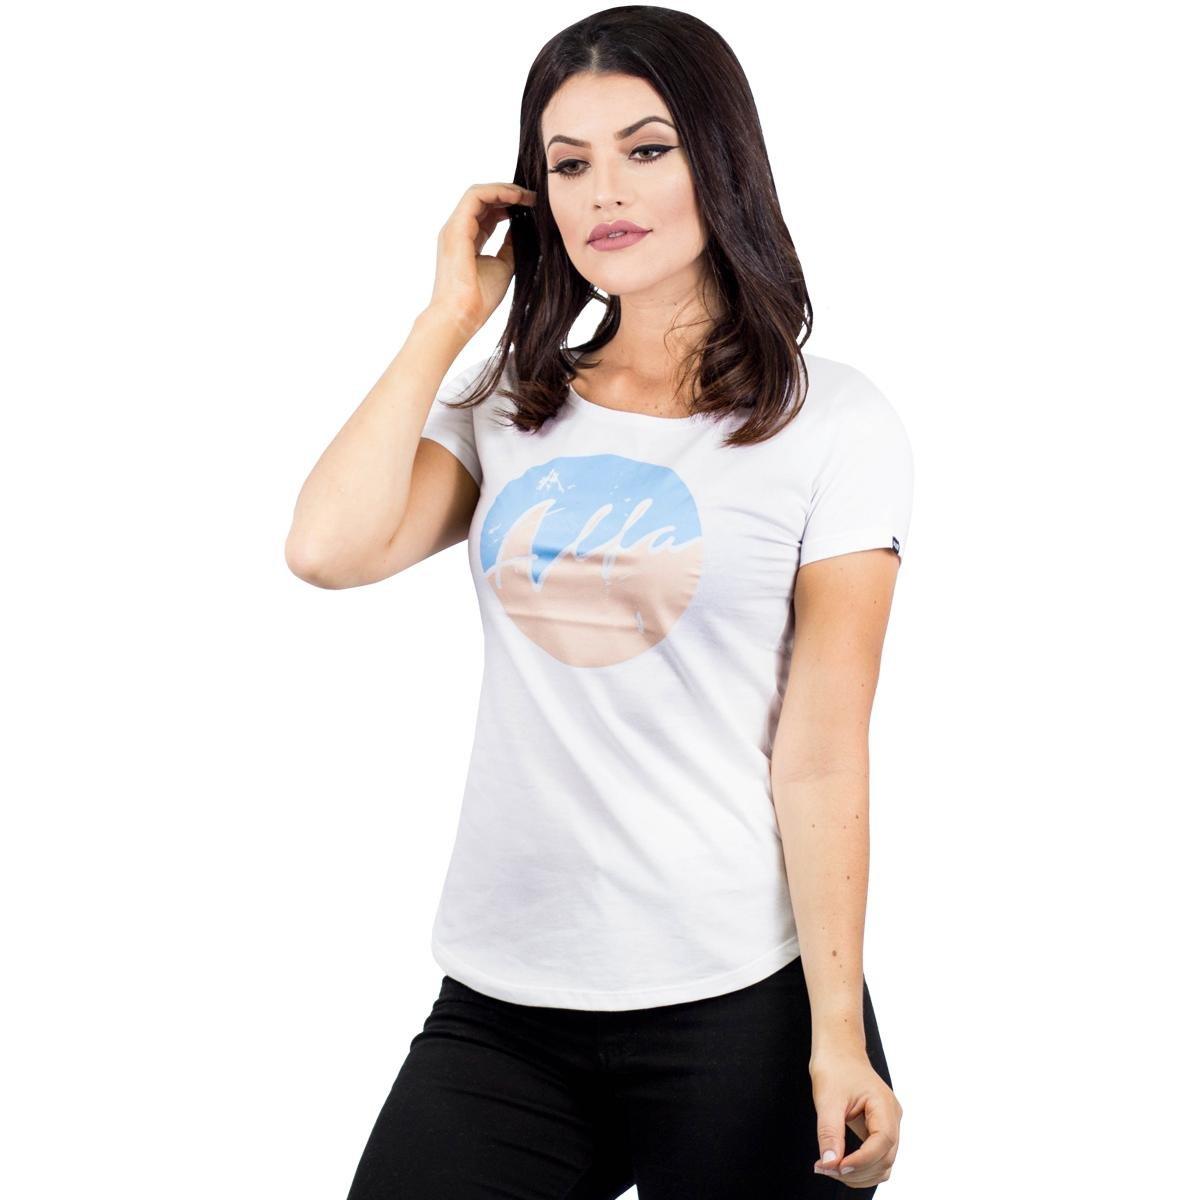 Stripe Camiseta Candy Branco Camiseta Alfa Alfa wOz8qxOYn